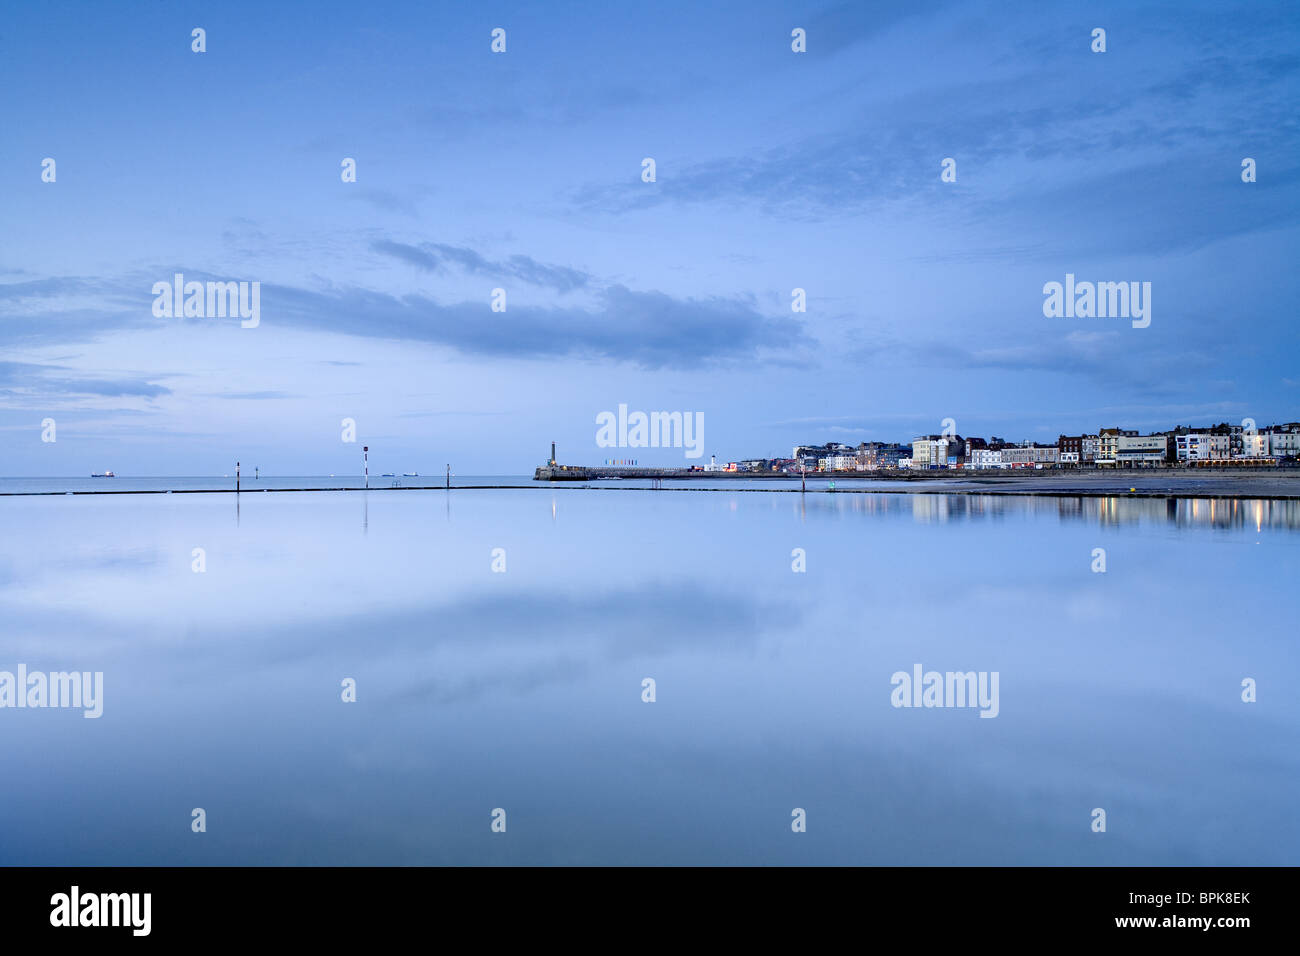 Ciudad costera de Margate, Kent, Inglaterra, Gran Bretaña, Europa Imagen De Stock